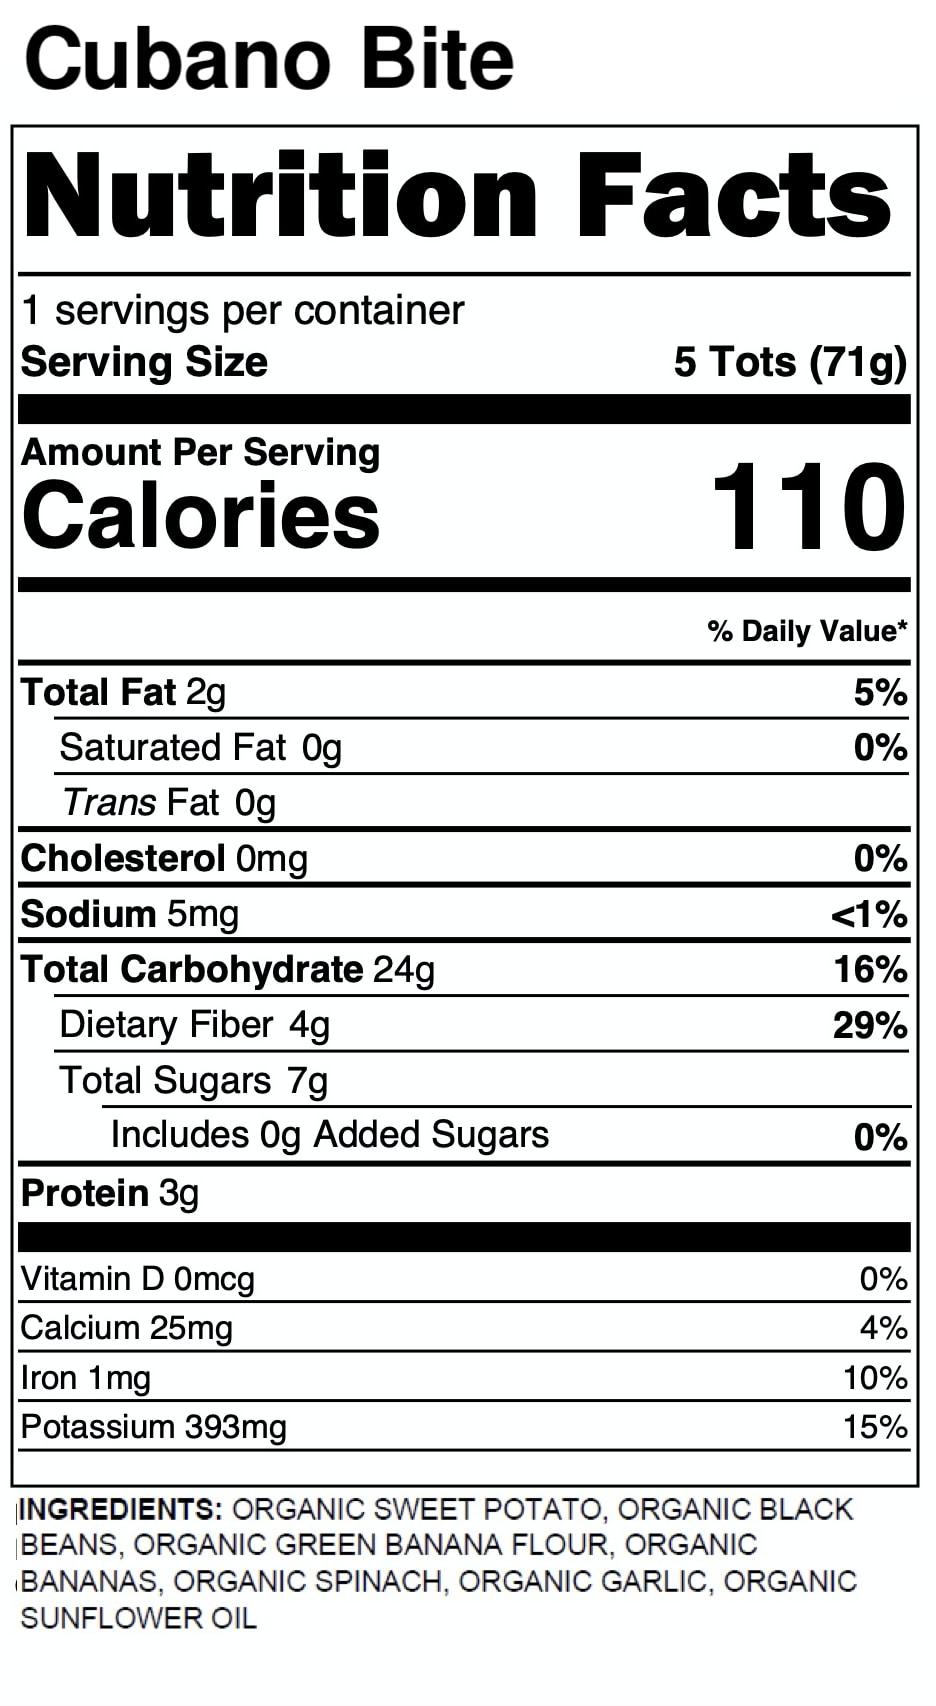 Yumi Cubano Bite nutrition facts